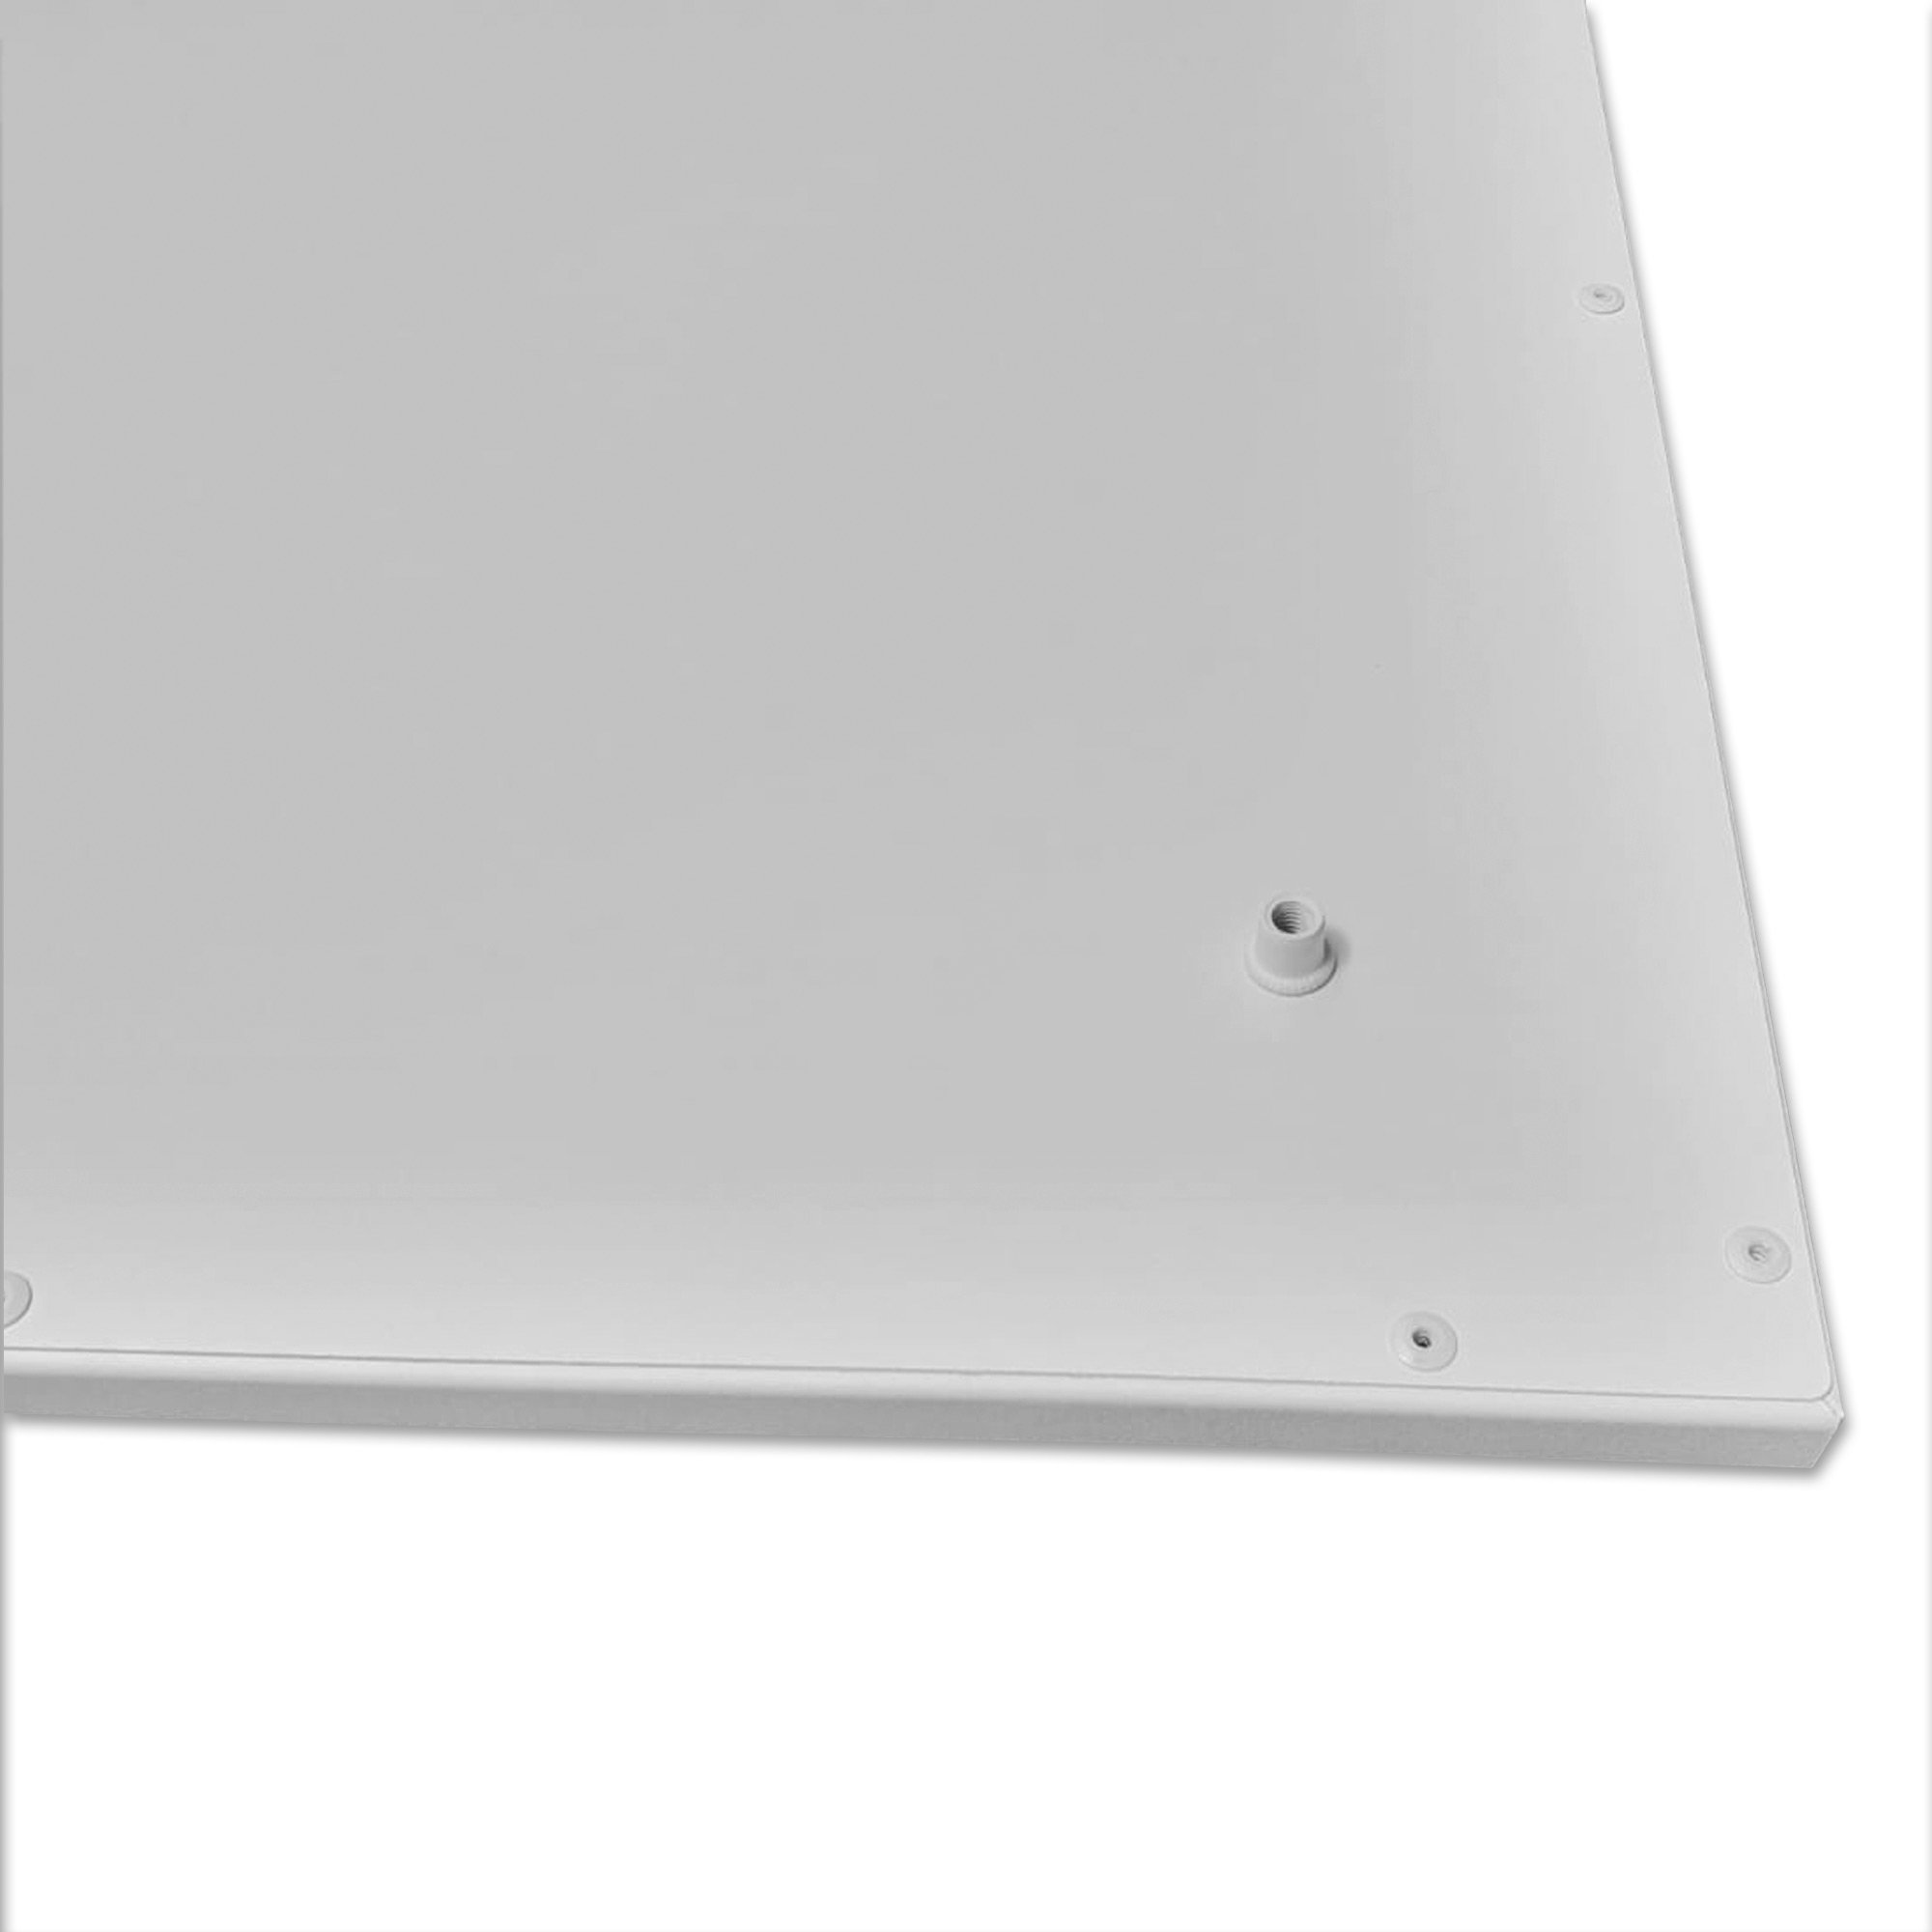 Infrared Ceiling Tile Heater For Suspended Ceilings